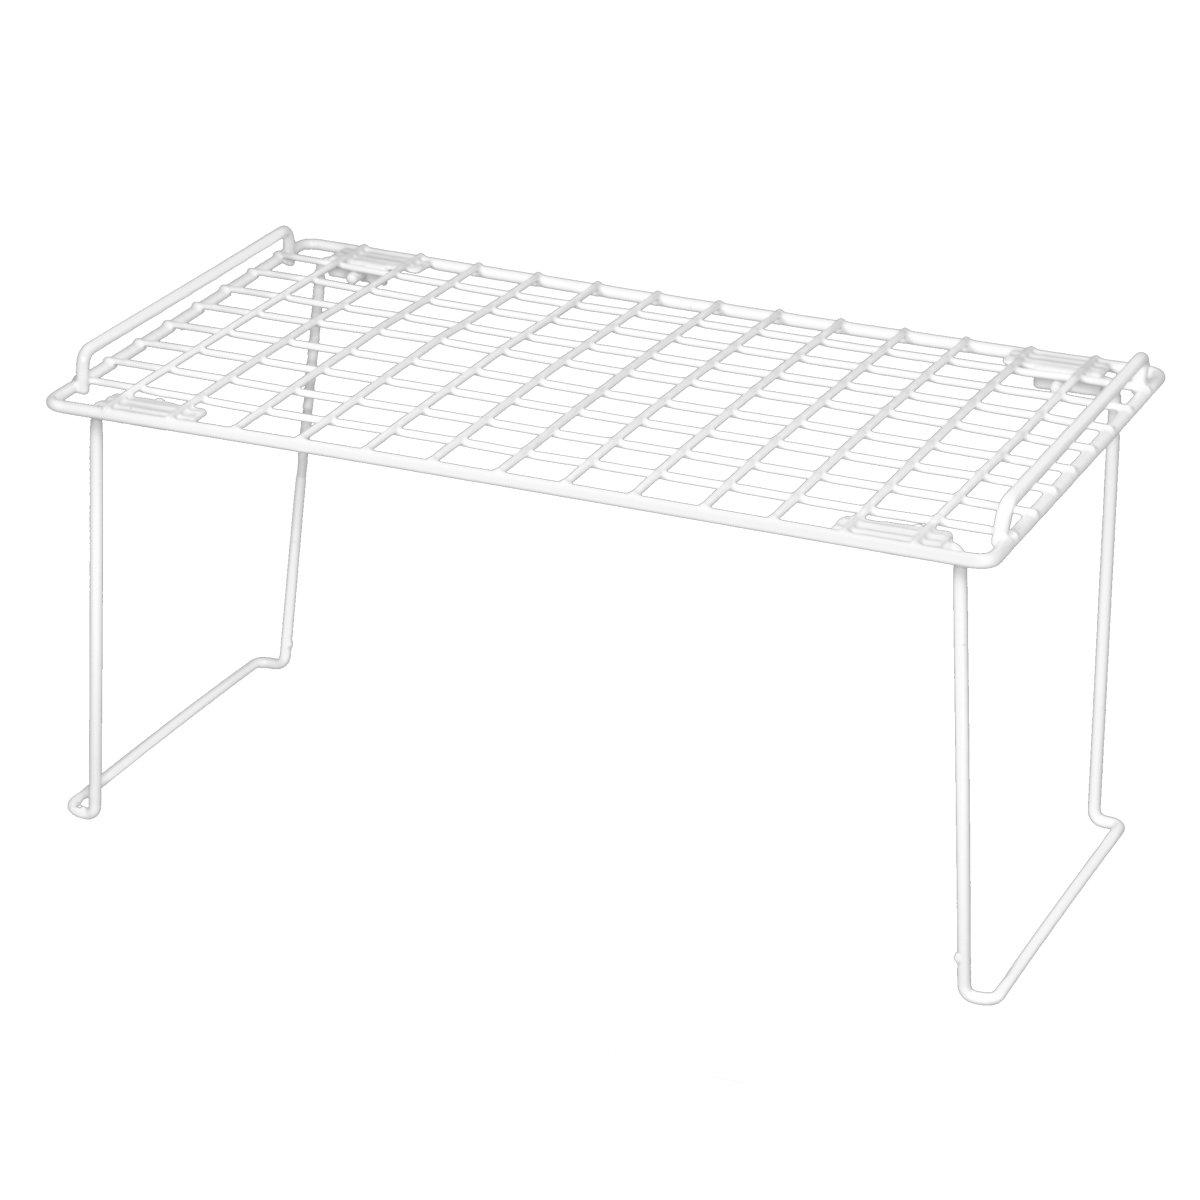 Smart Design Stacking Shelf w/Sturdy Legs - Small - Steel Metal Frame - Rust Resistant Coating - Counter, Pantry, Shelf Organization - Kitchen (12 x 7 Inch) [Bronze]